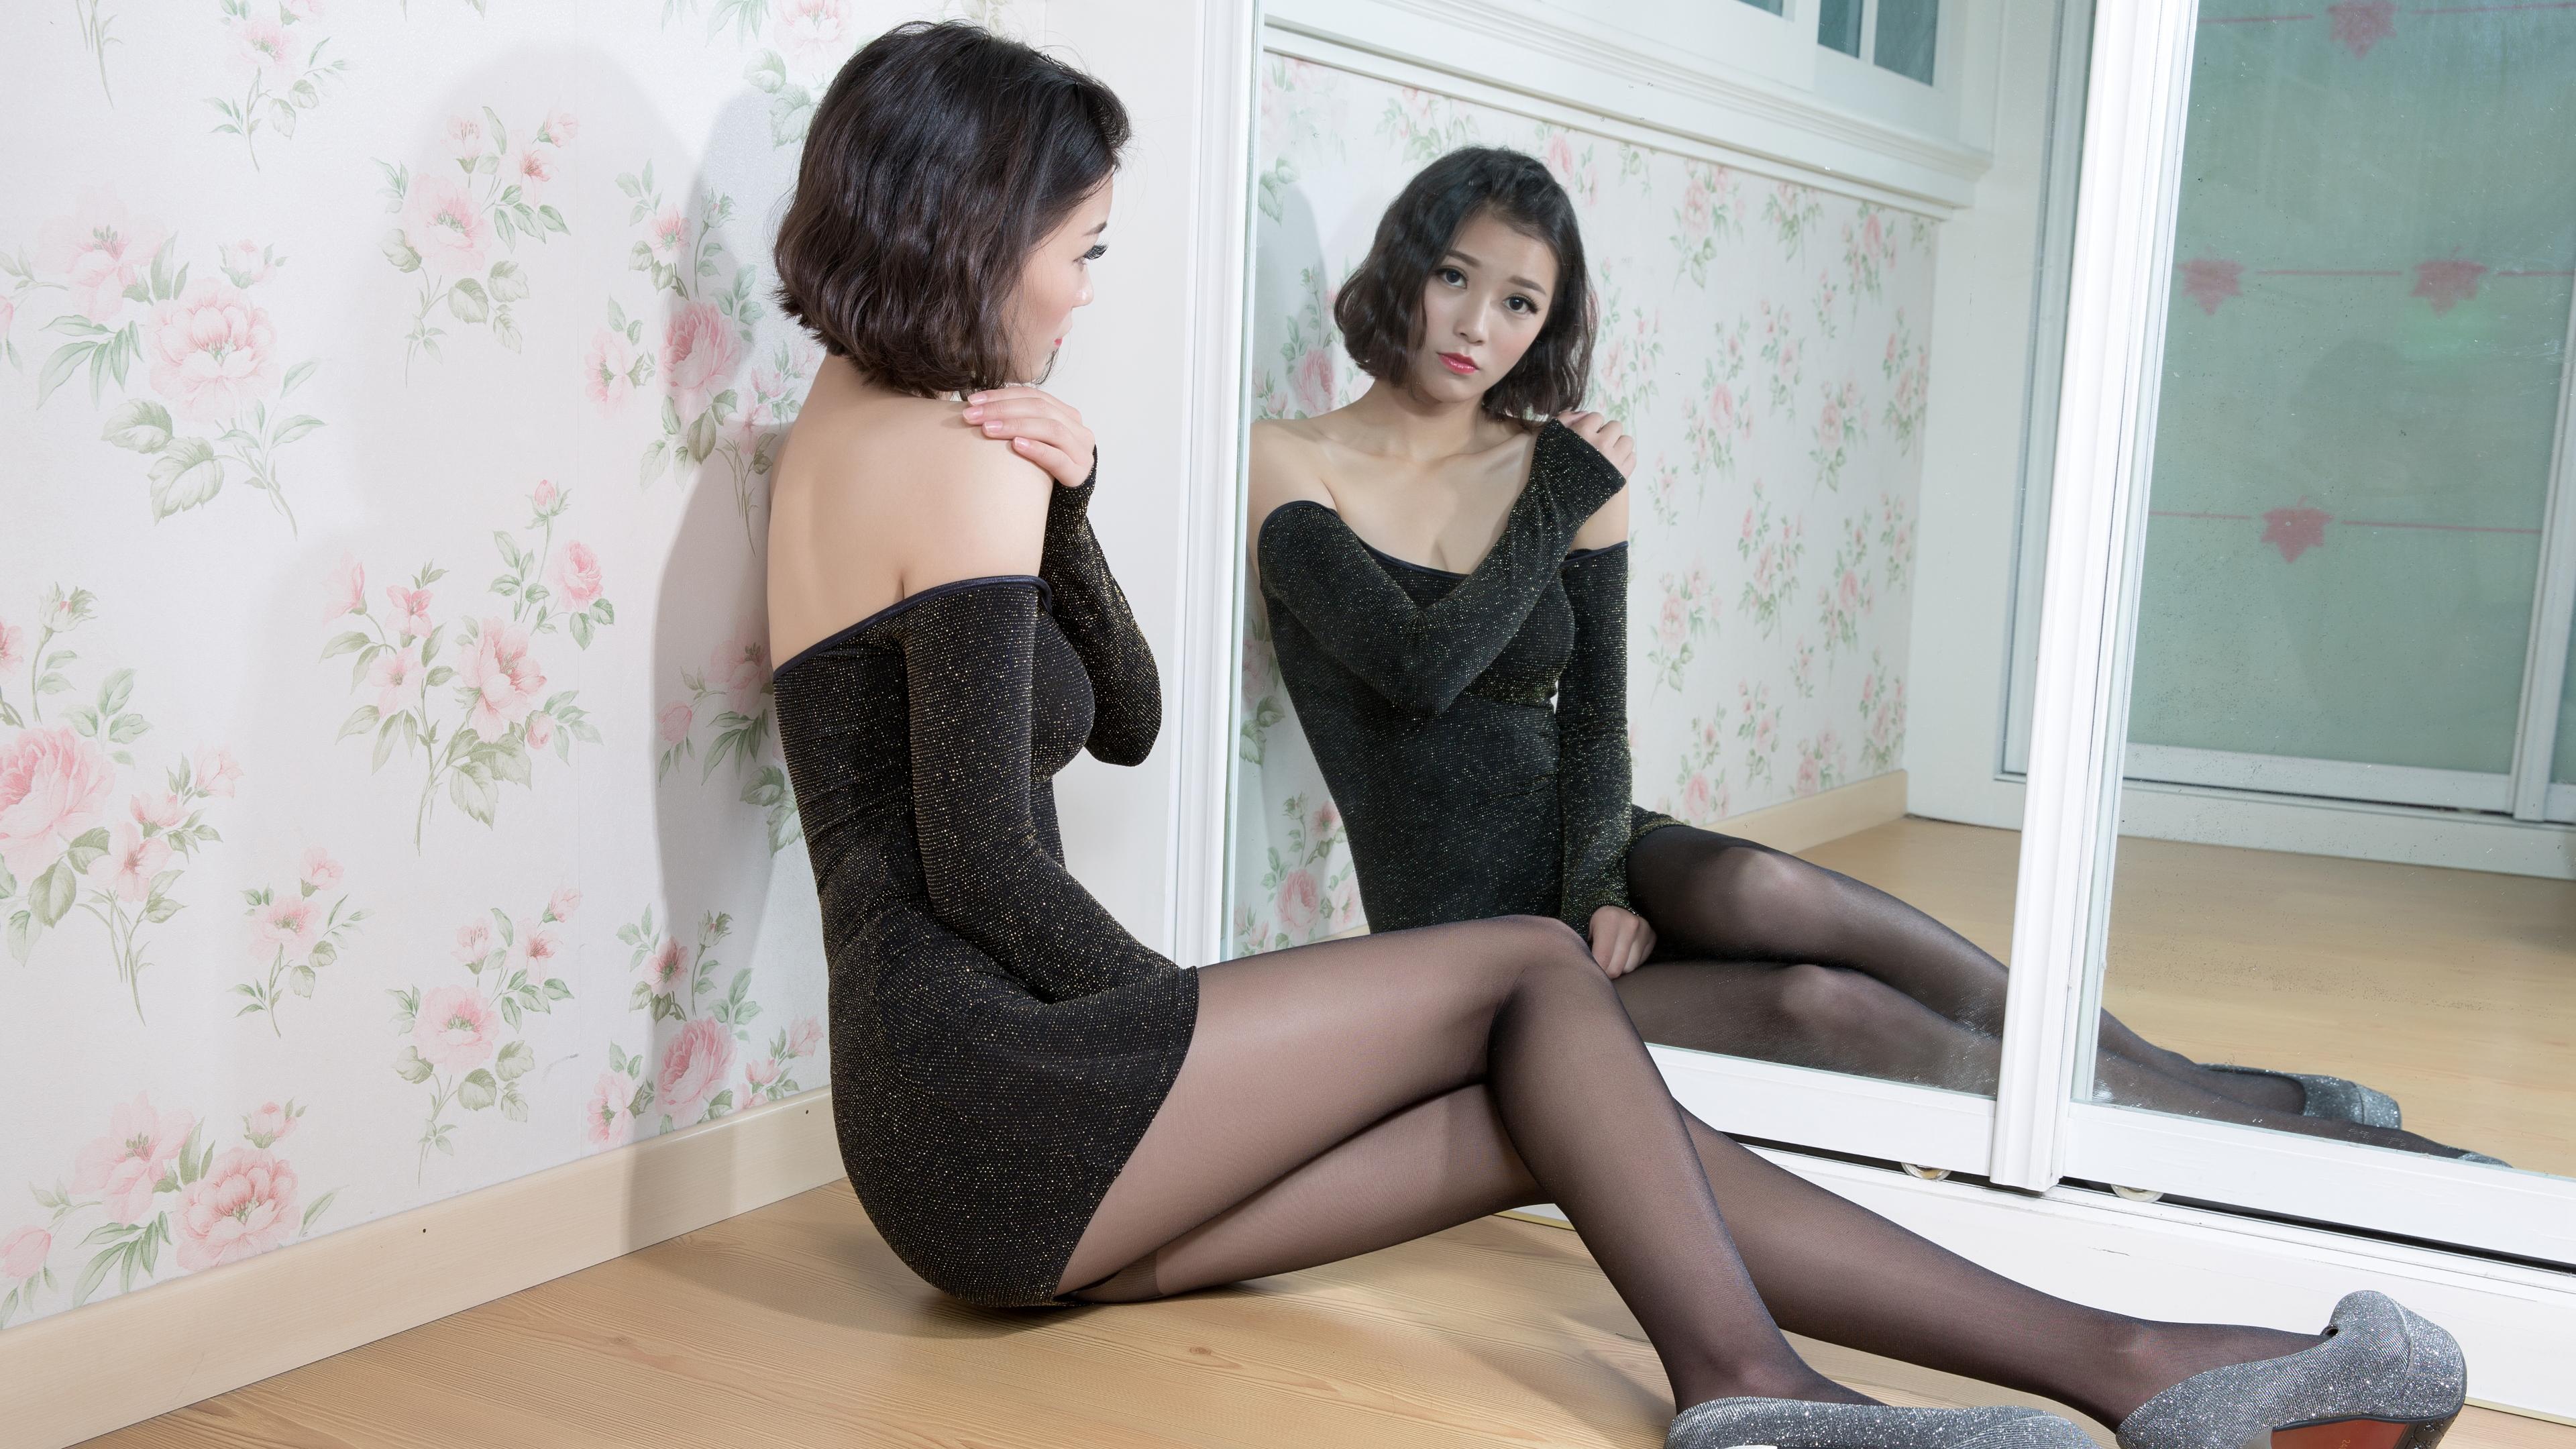 People 3840x2160 model Asian women pantyhose short hair